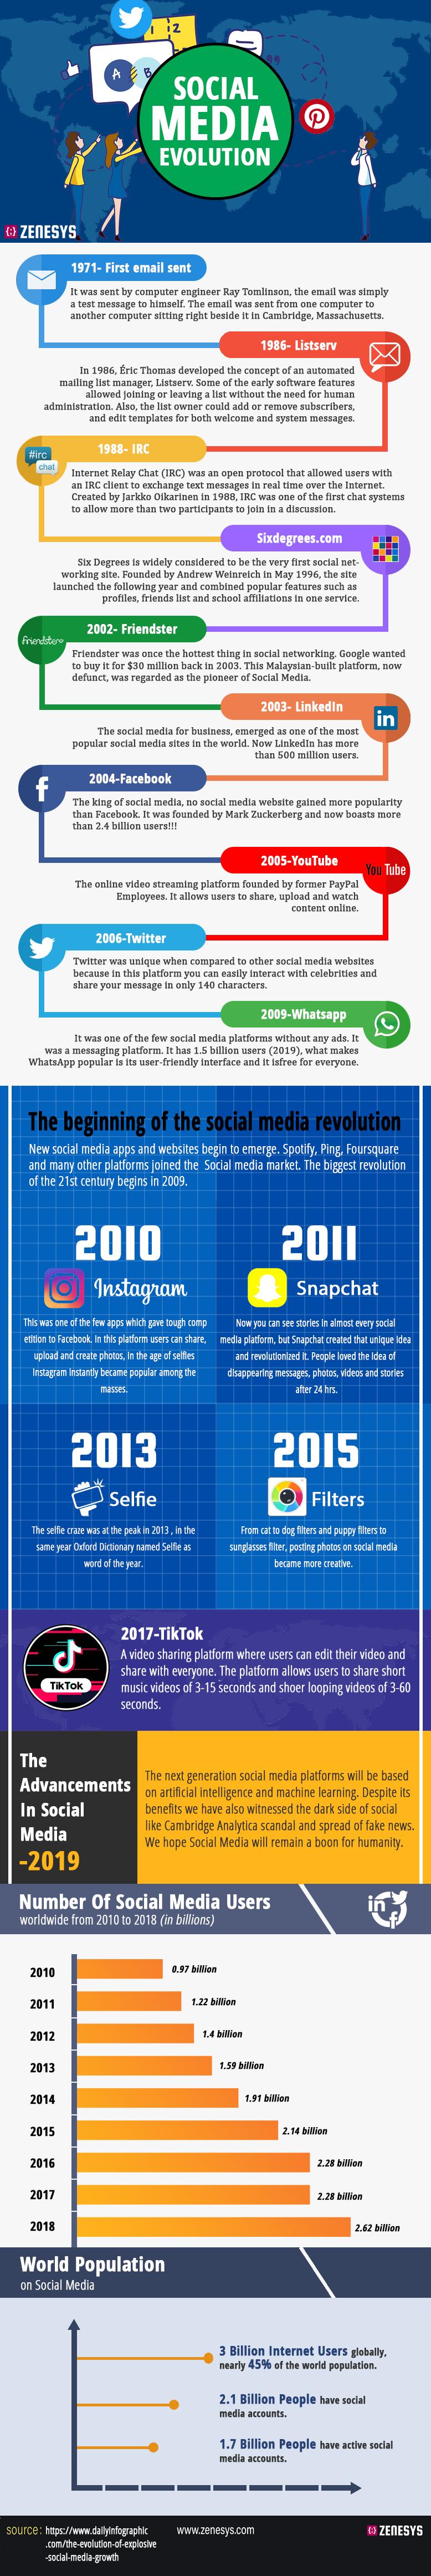 The evolution of #Social_Media #SMM #Infographic